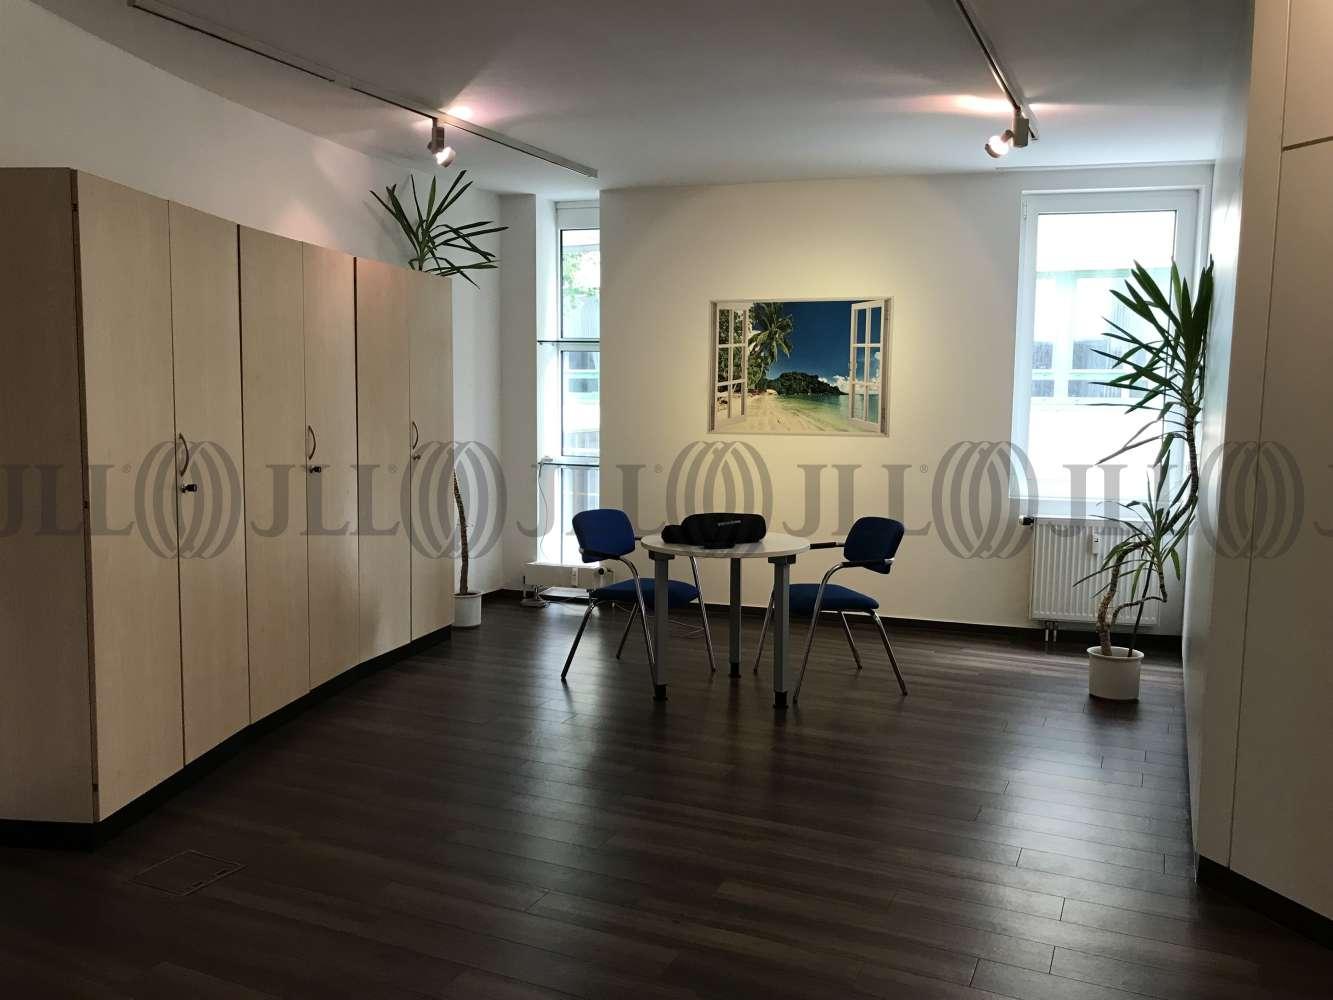 Büros Leinfelden-echterdingen, 70771 - Büro - Leinfelden-Echterdingen, Echterdingen - S0197 - 10629314